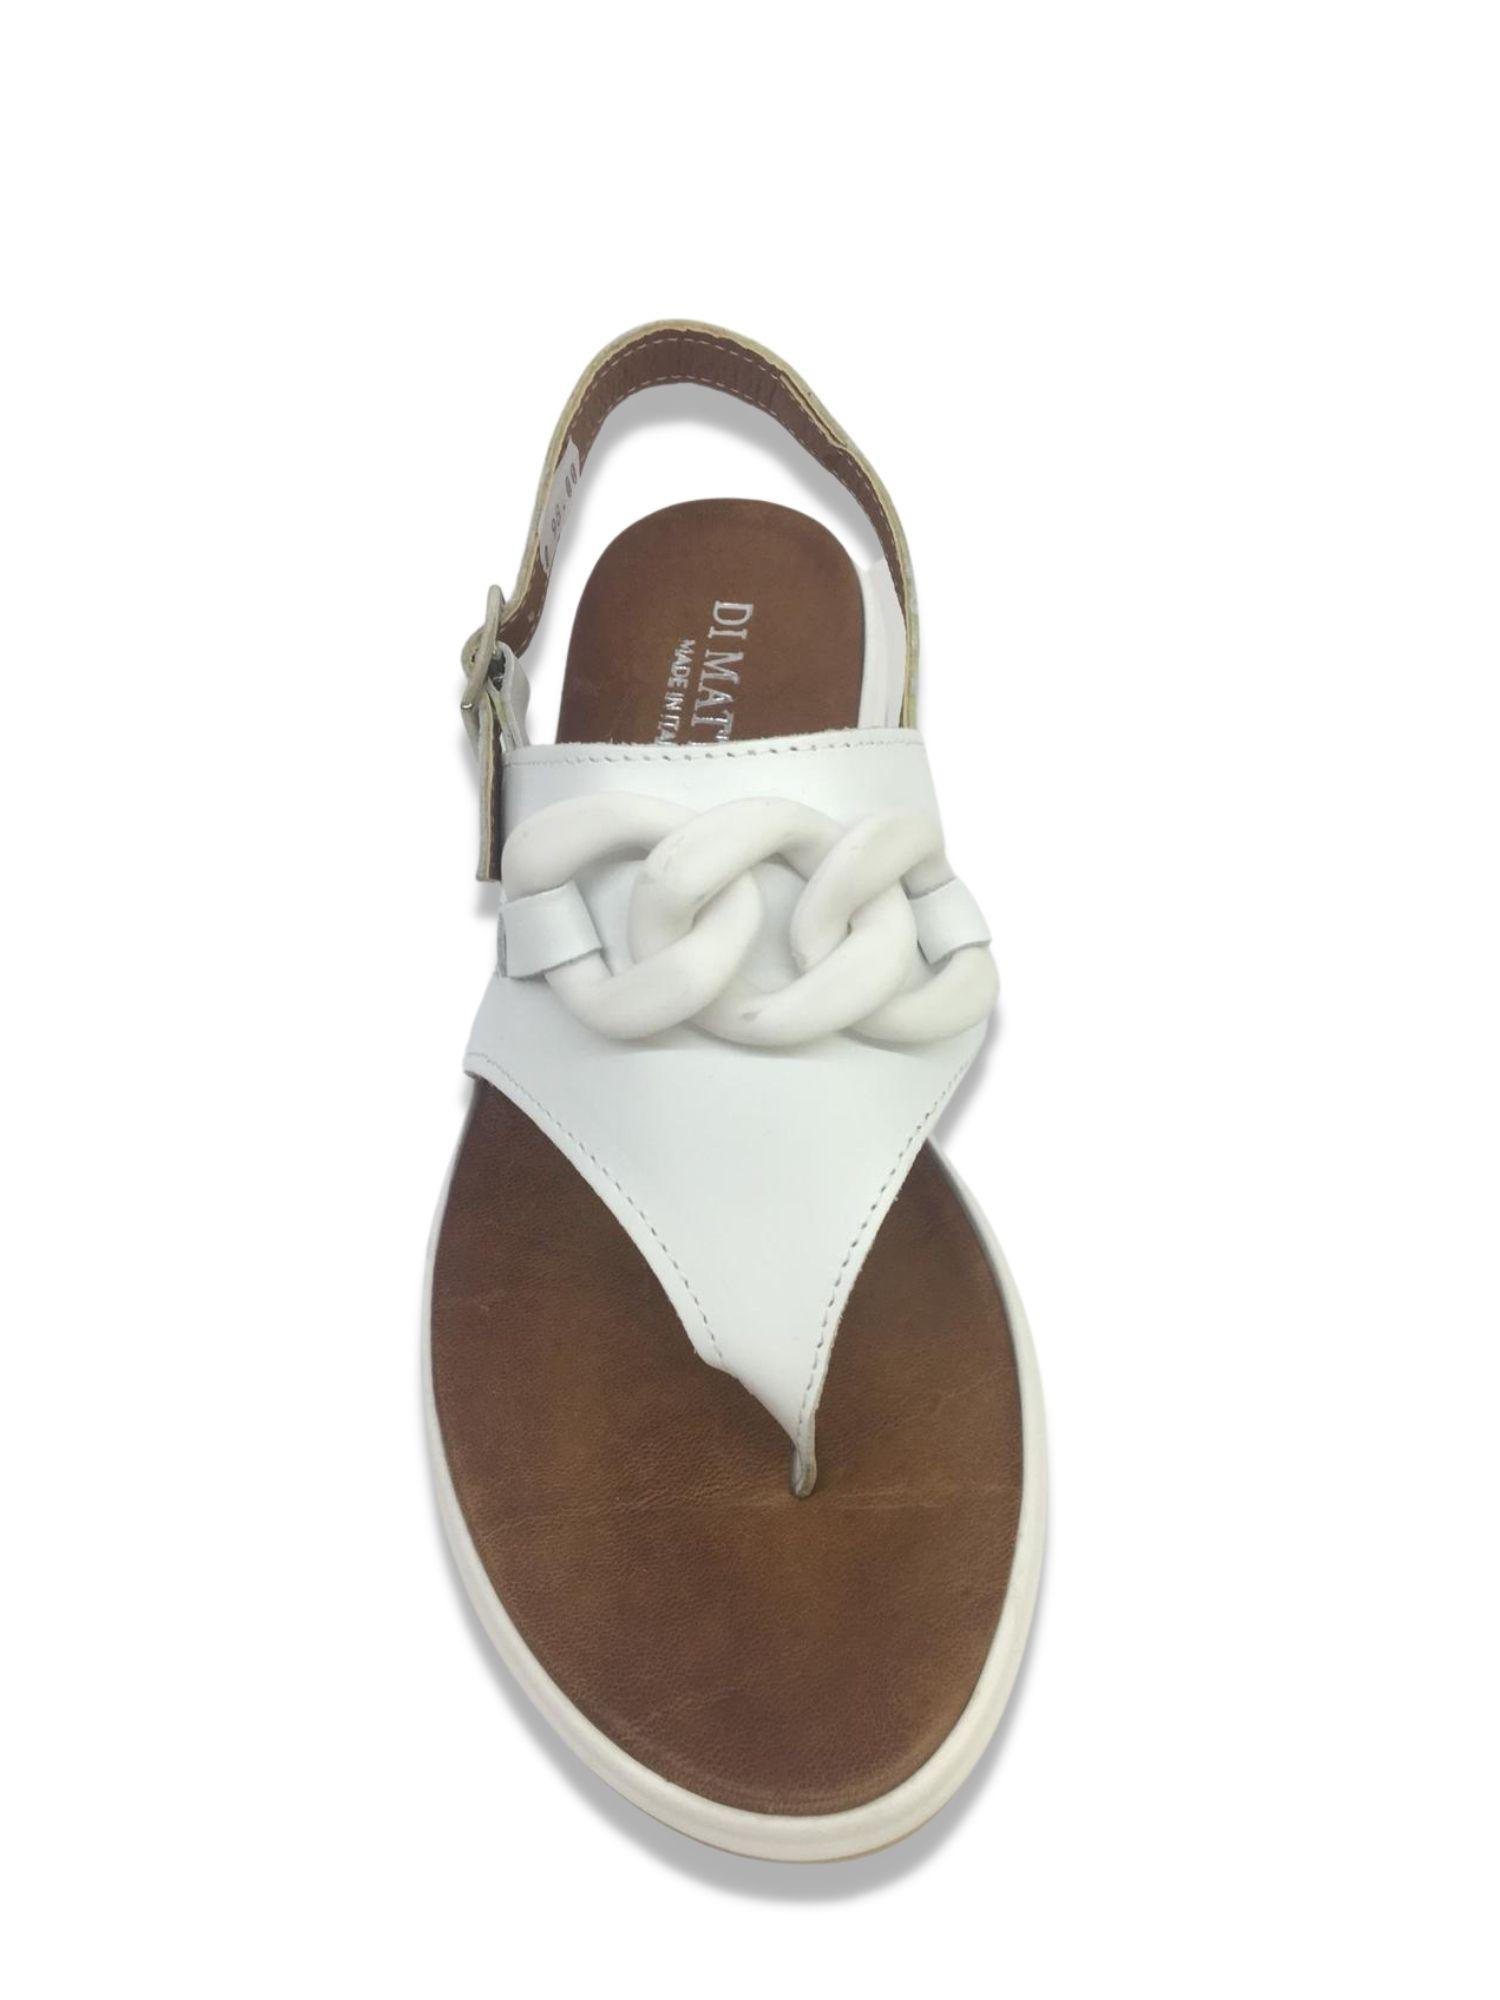 Sandalo Infradito Made in Italy 303 Bianco alto